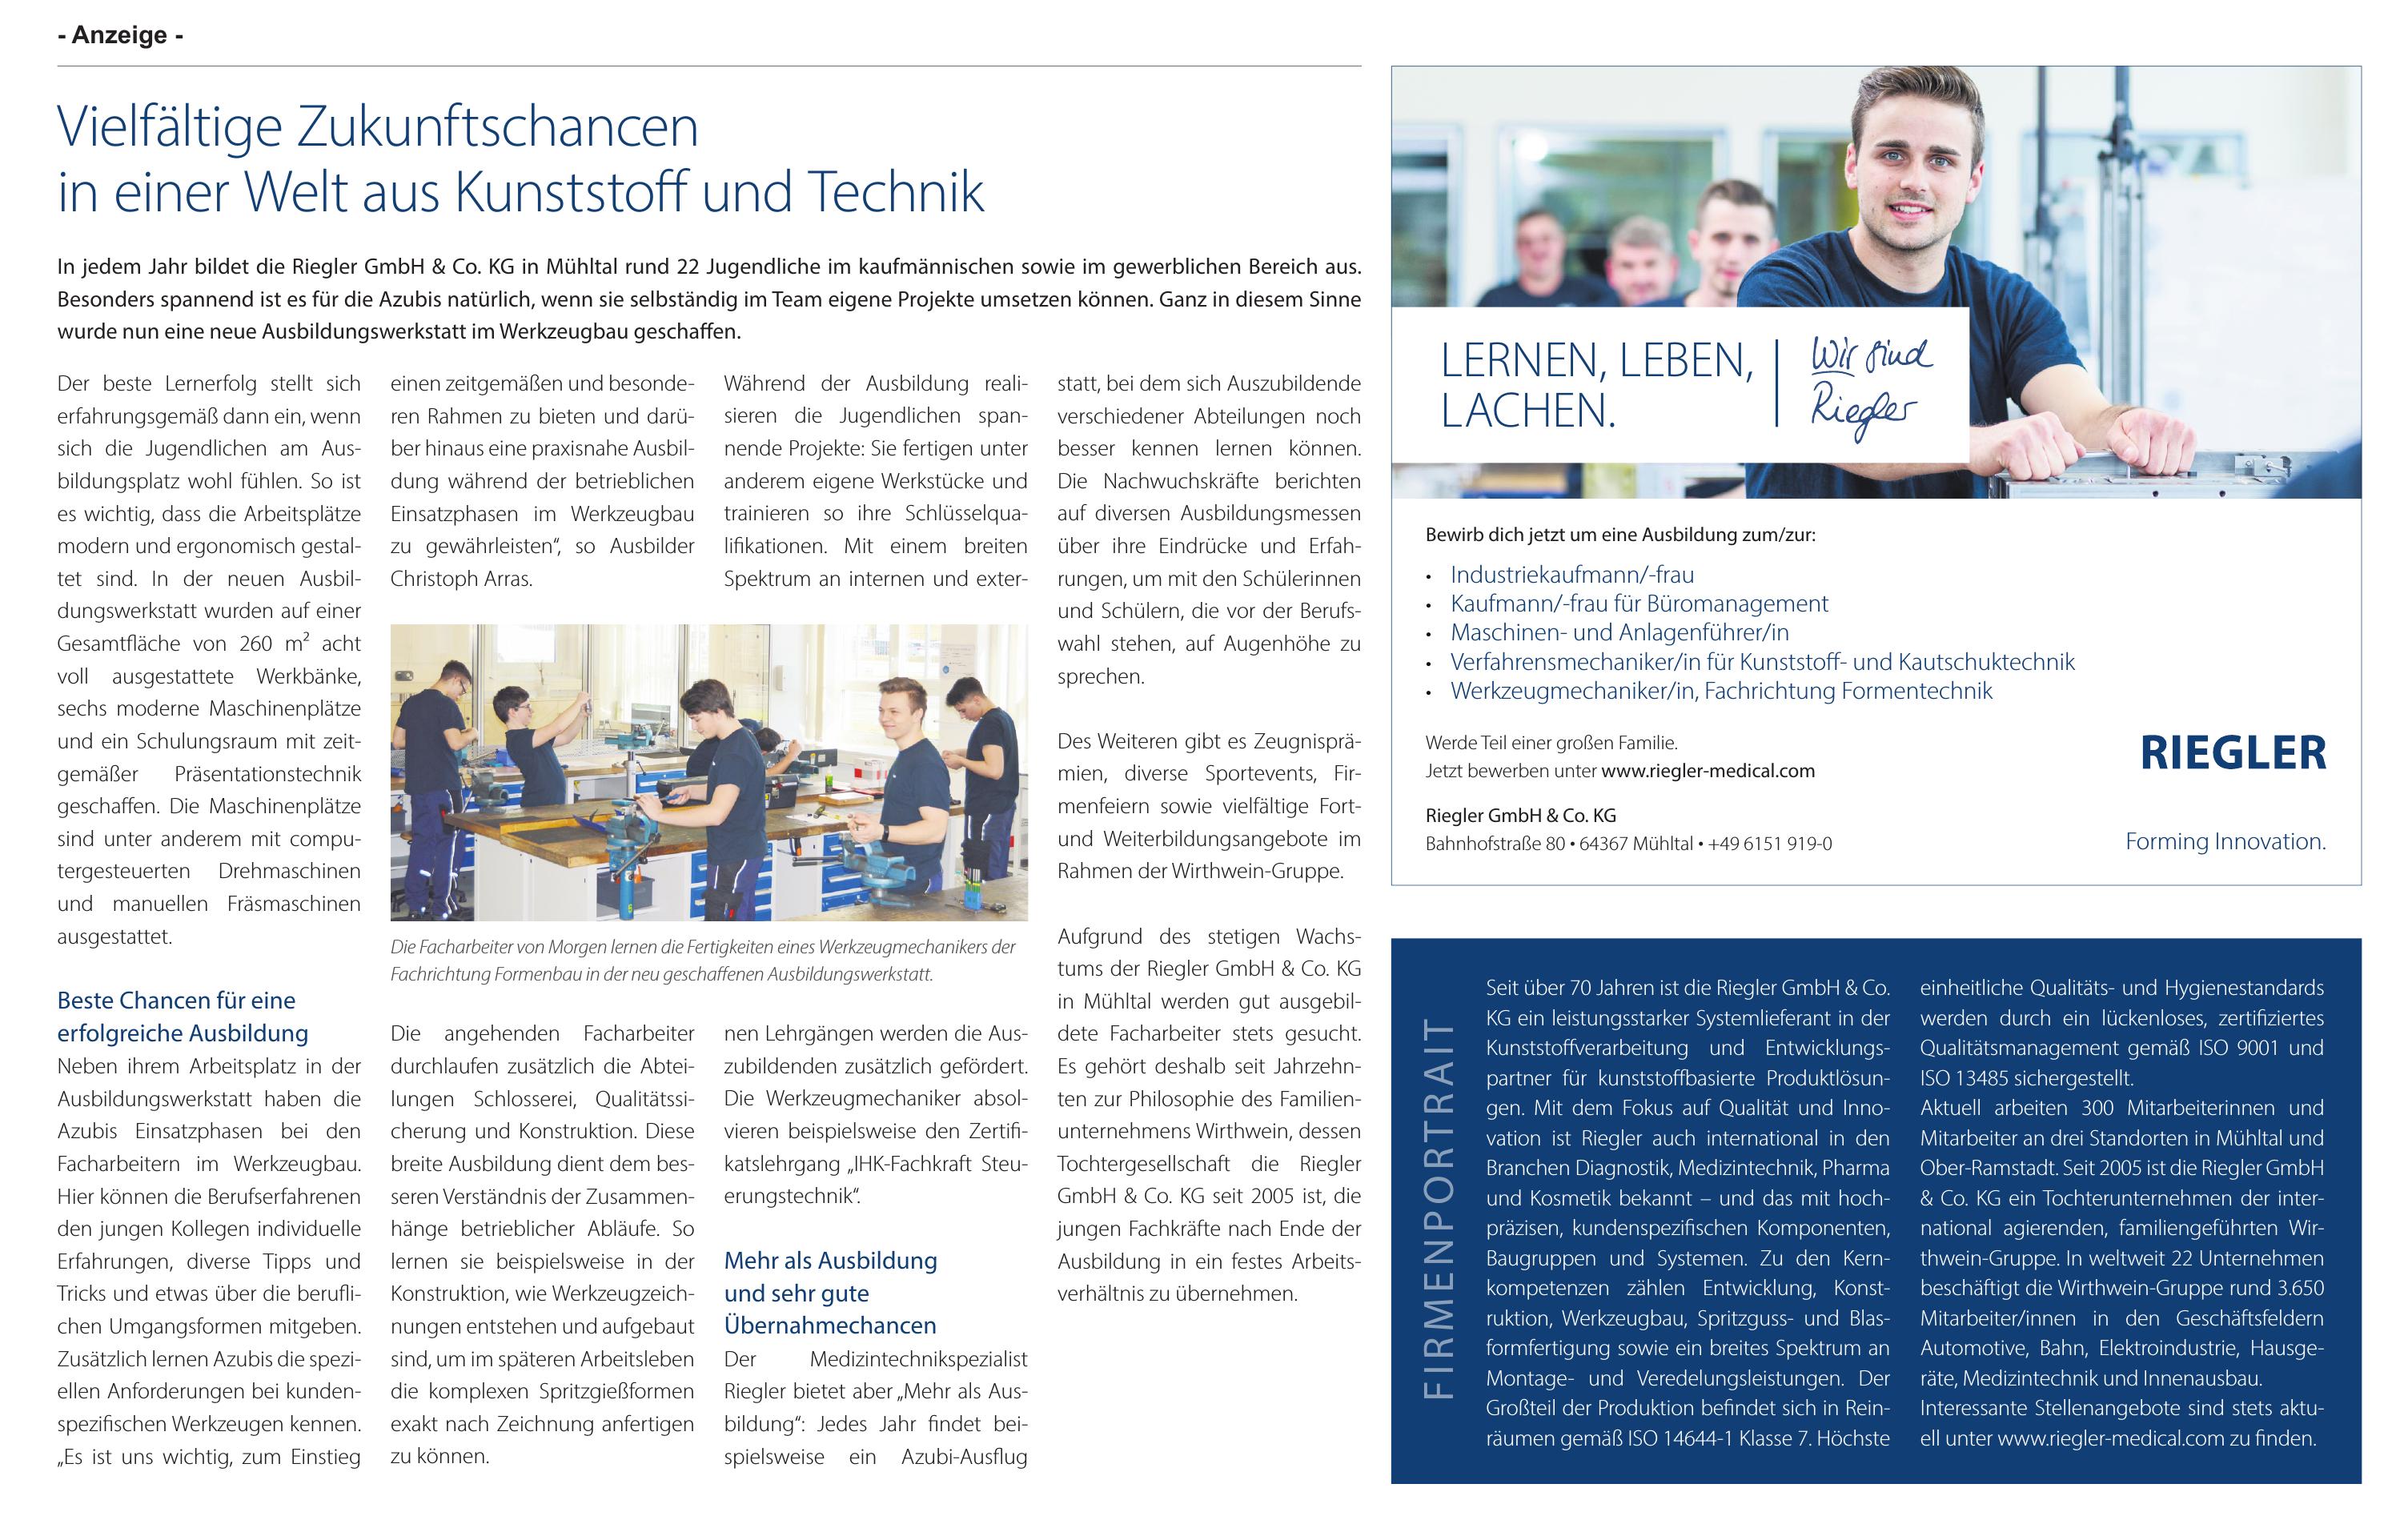 Riegler GmbH & Co. KG